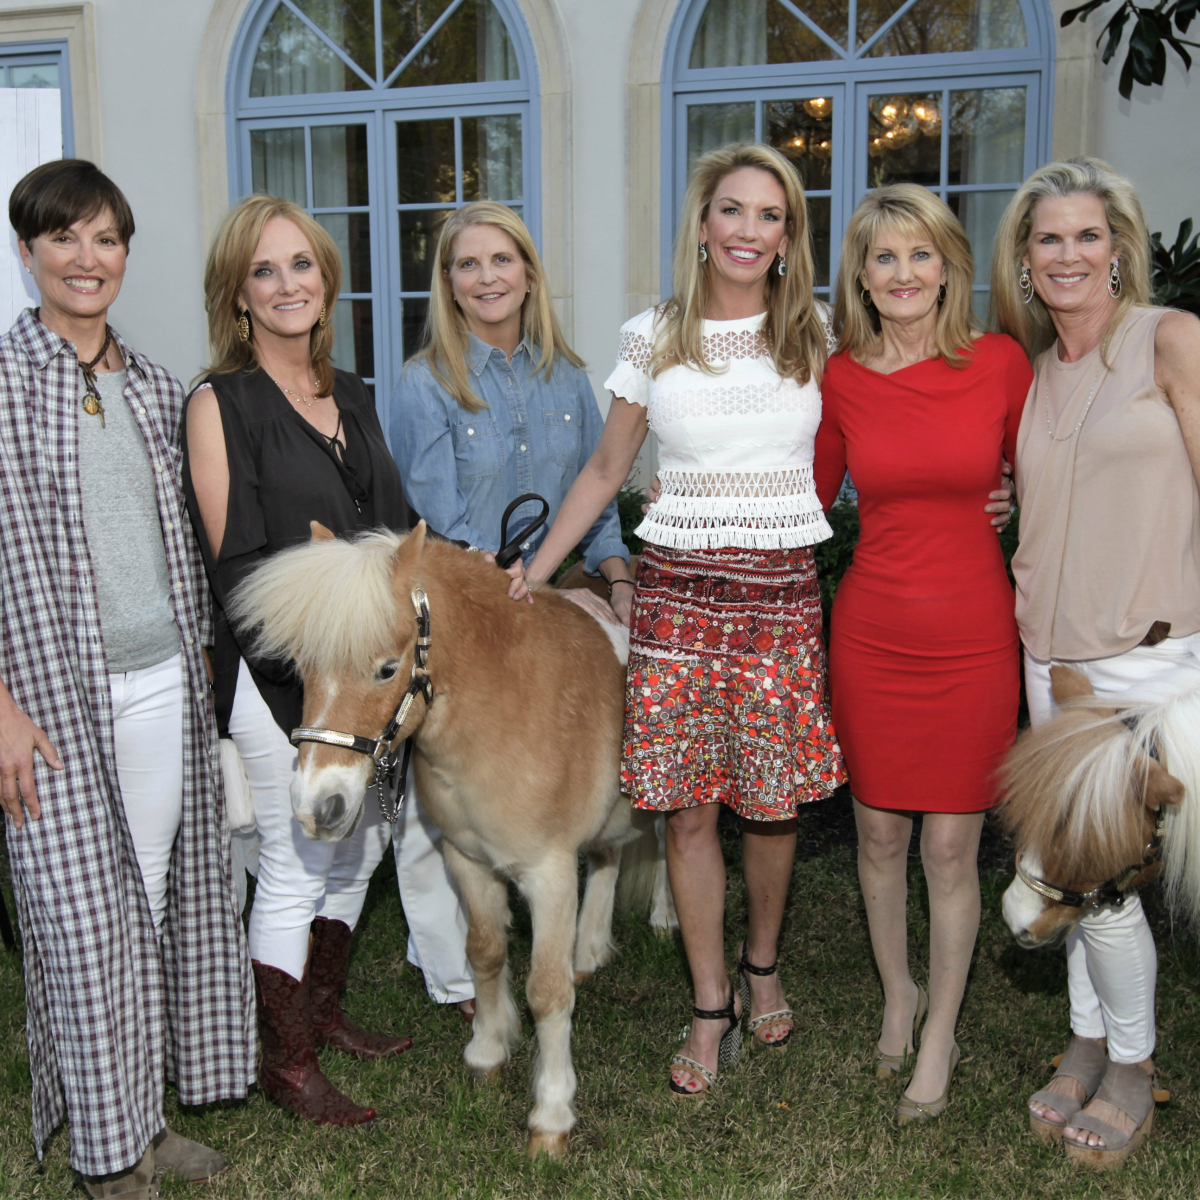 Terri Sue Wensinger, Kristin Reed, Mary Hawkins, Helena Wall, Karen Smith, Lezlie Noble